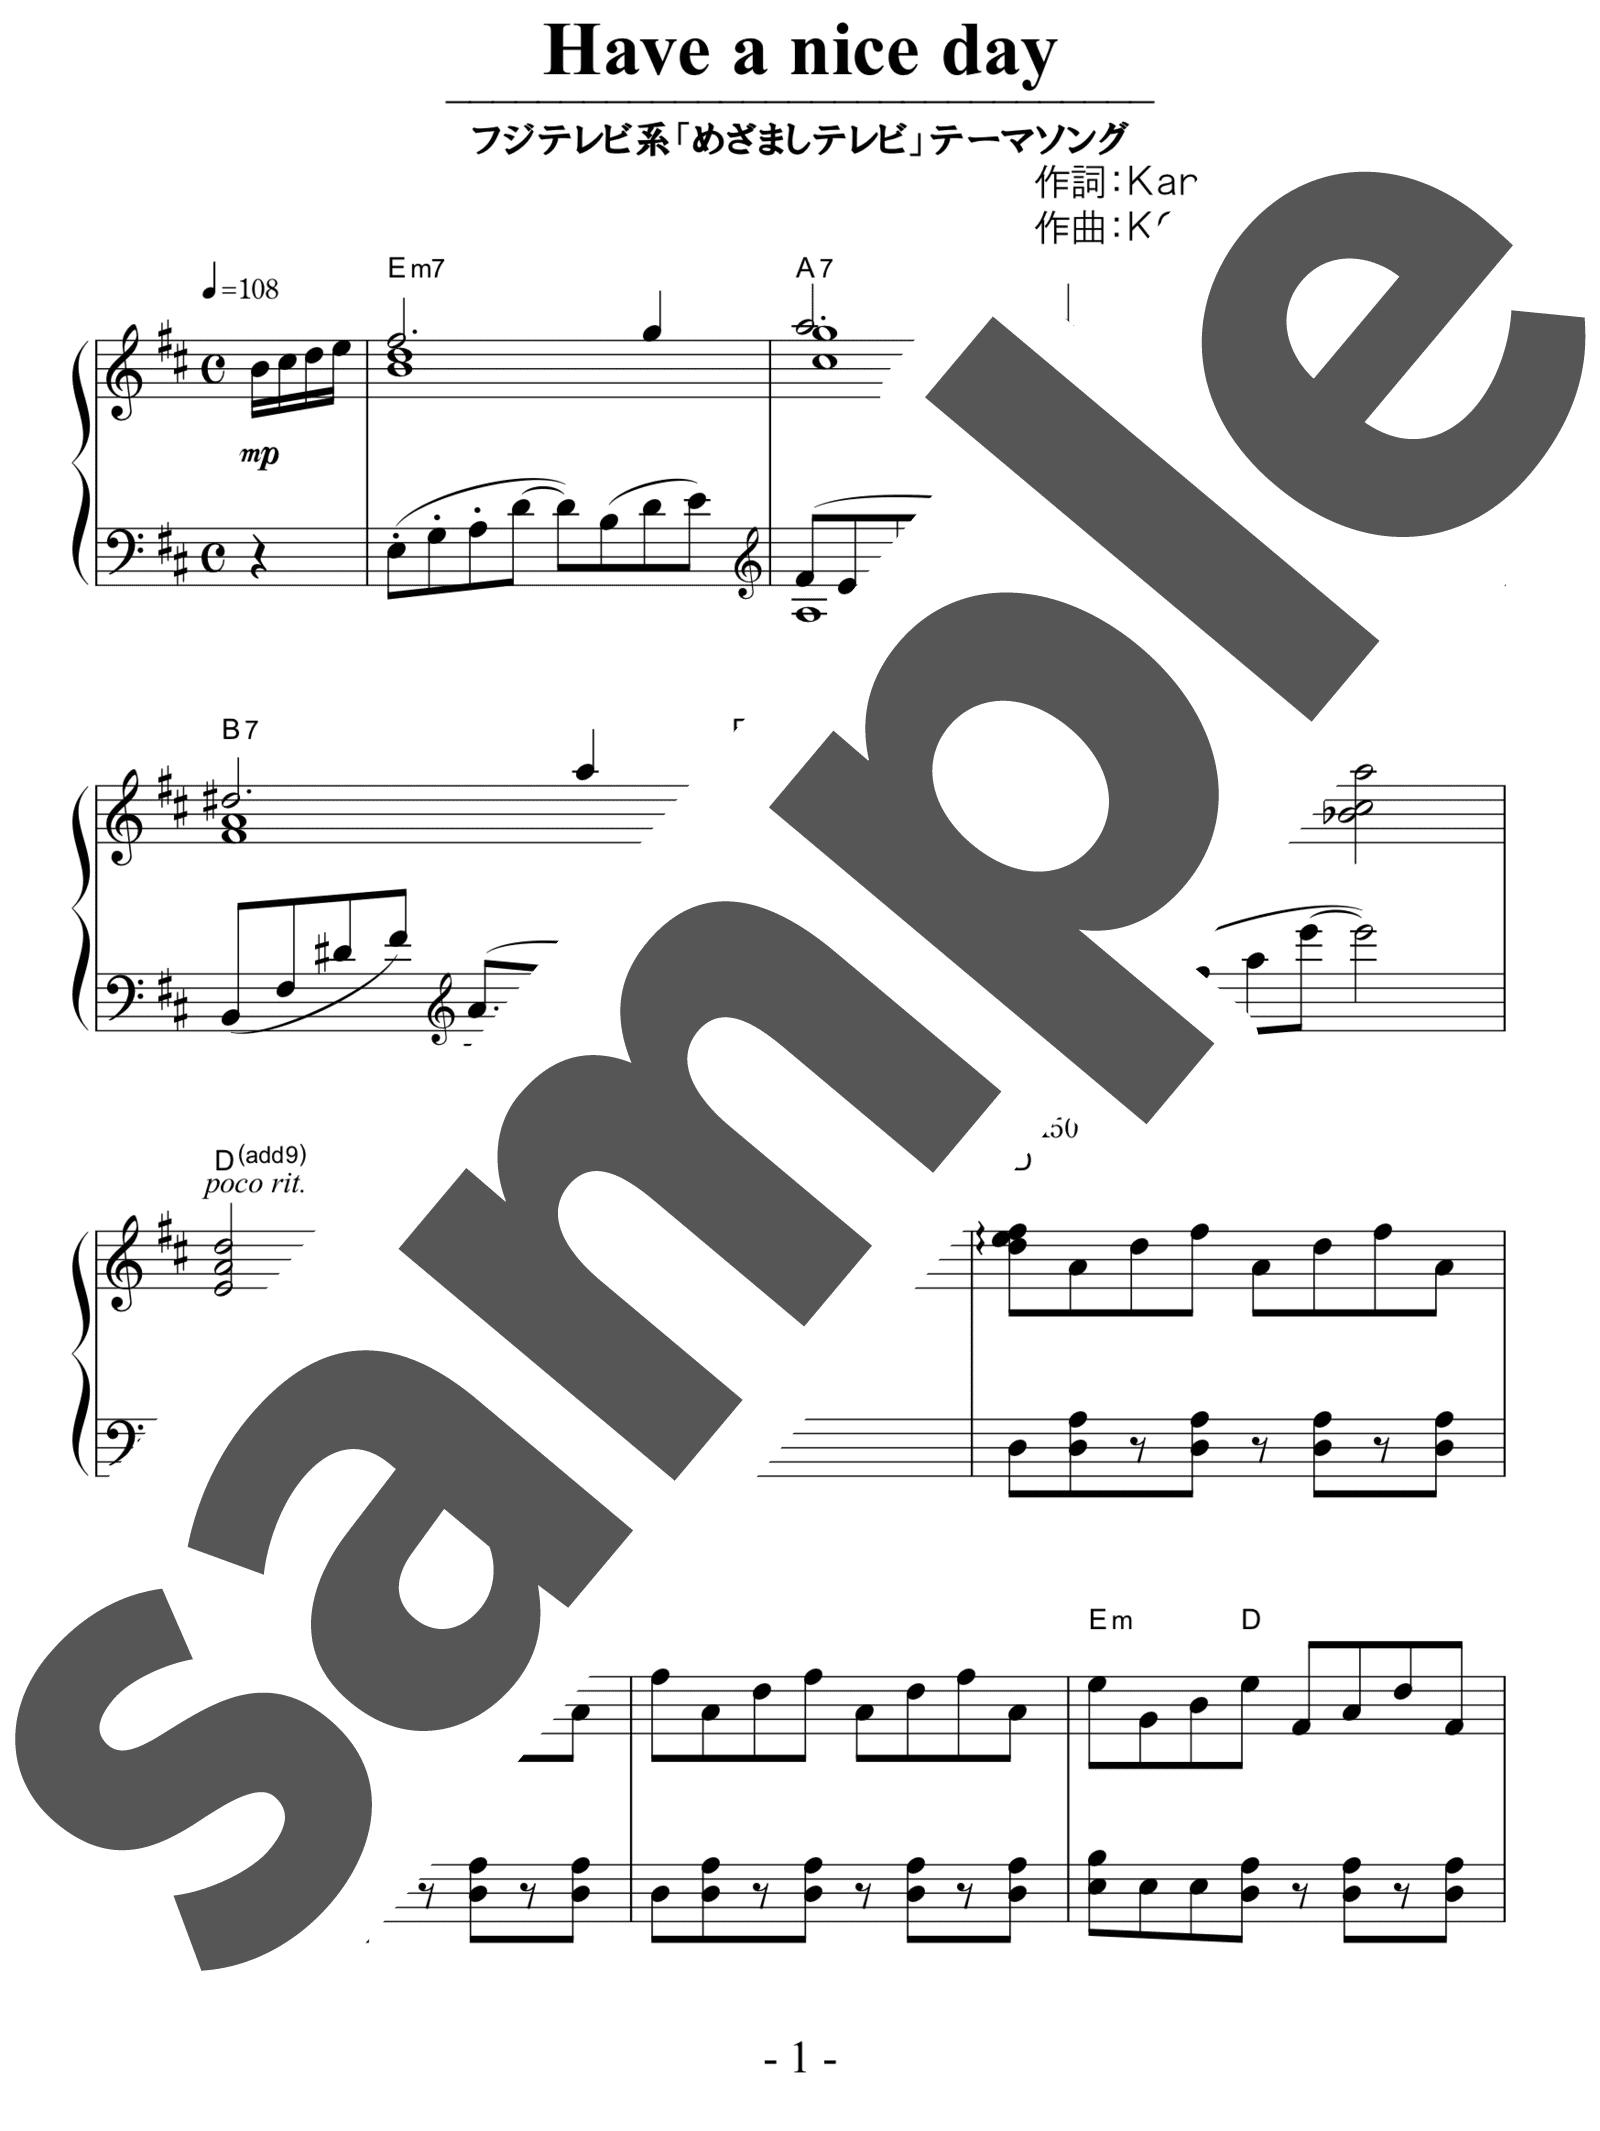 「Have a nice day」のサンプル楽譜